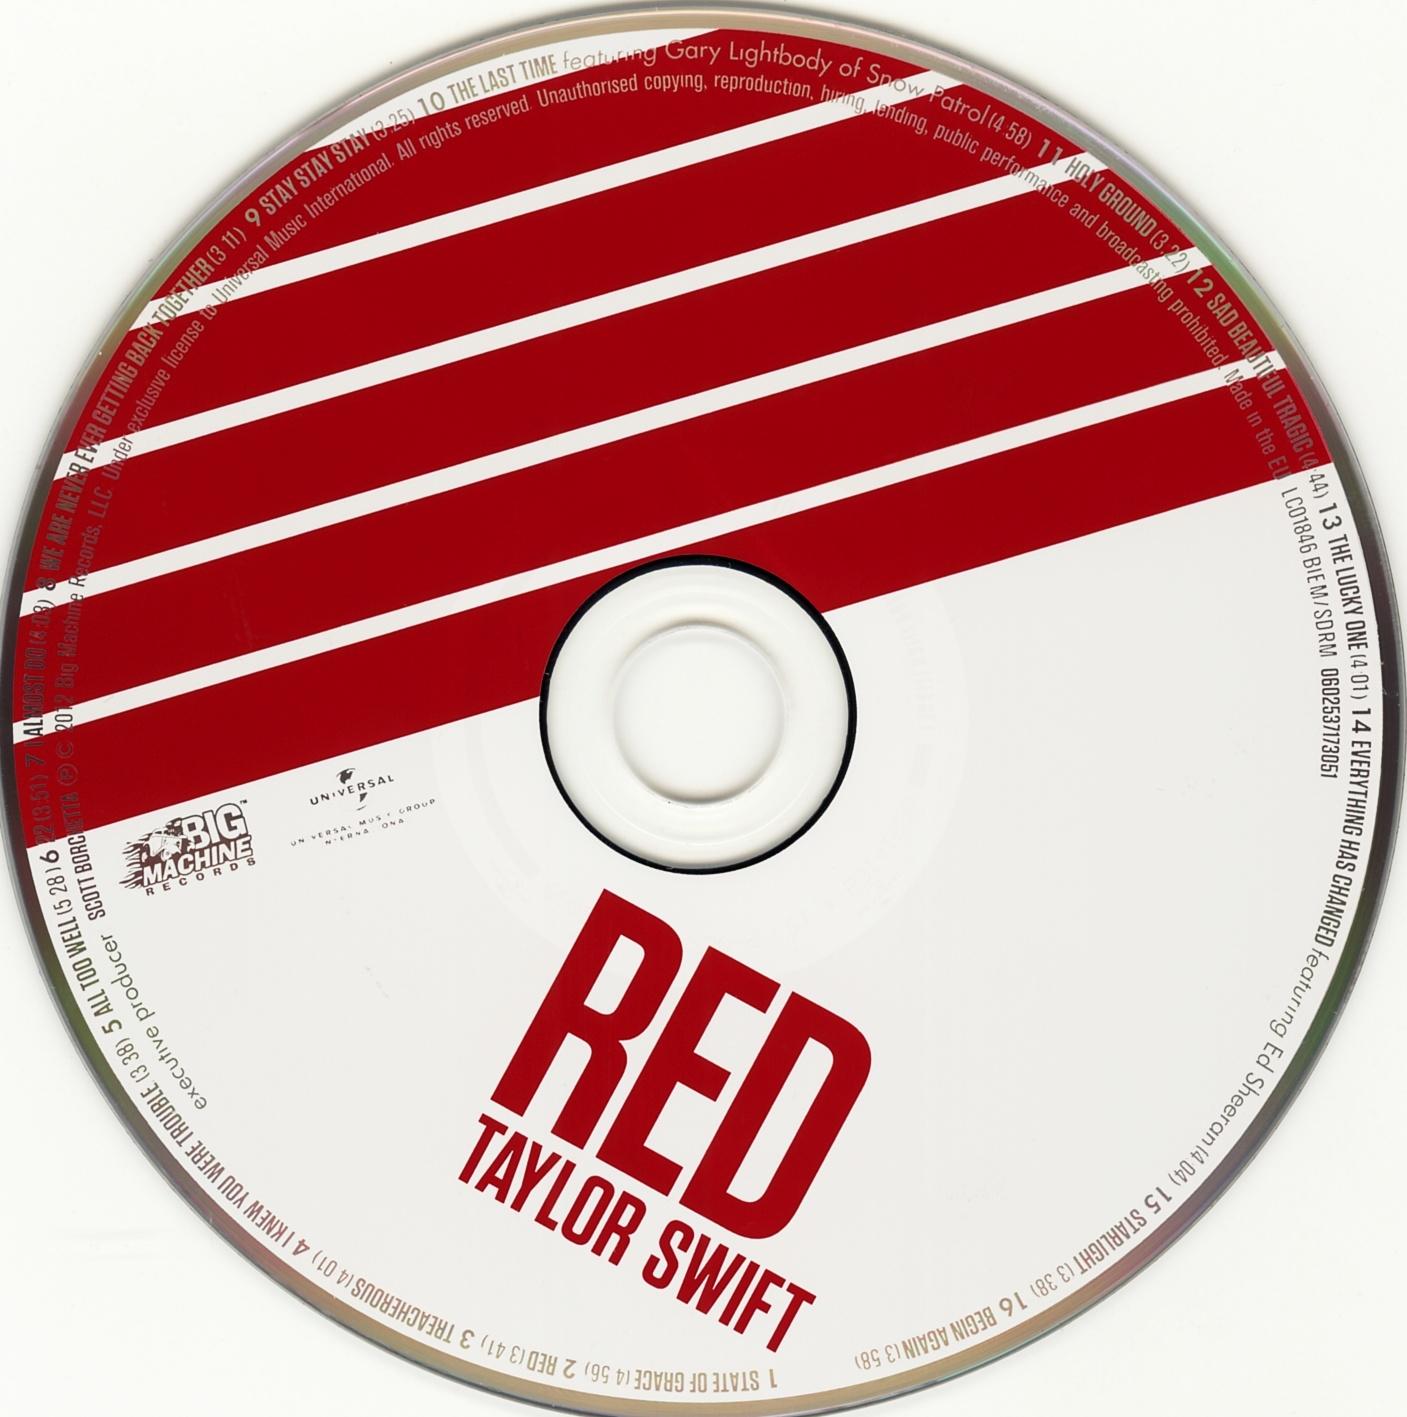 Taylor Swift Red Album Cover   Car Interior Design